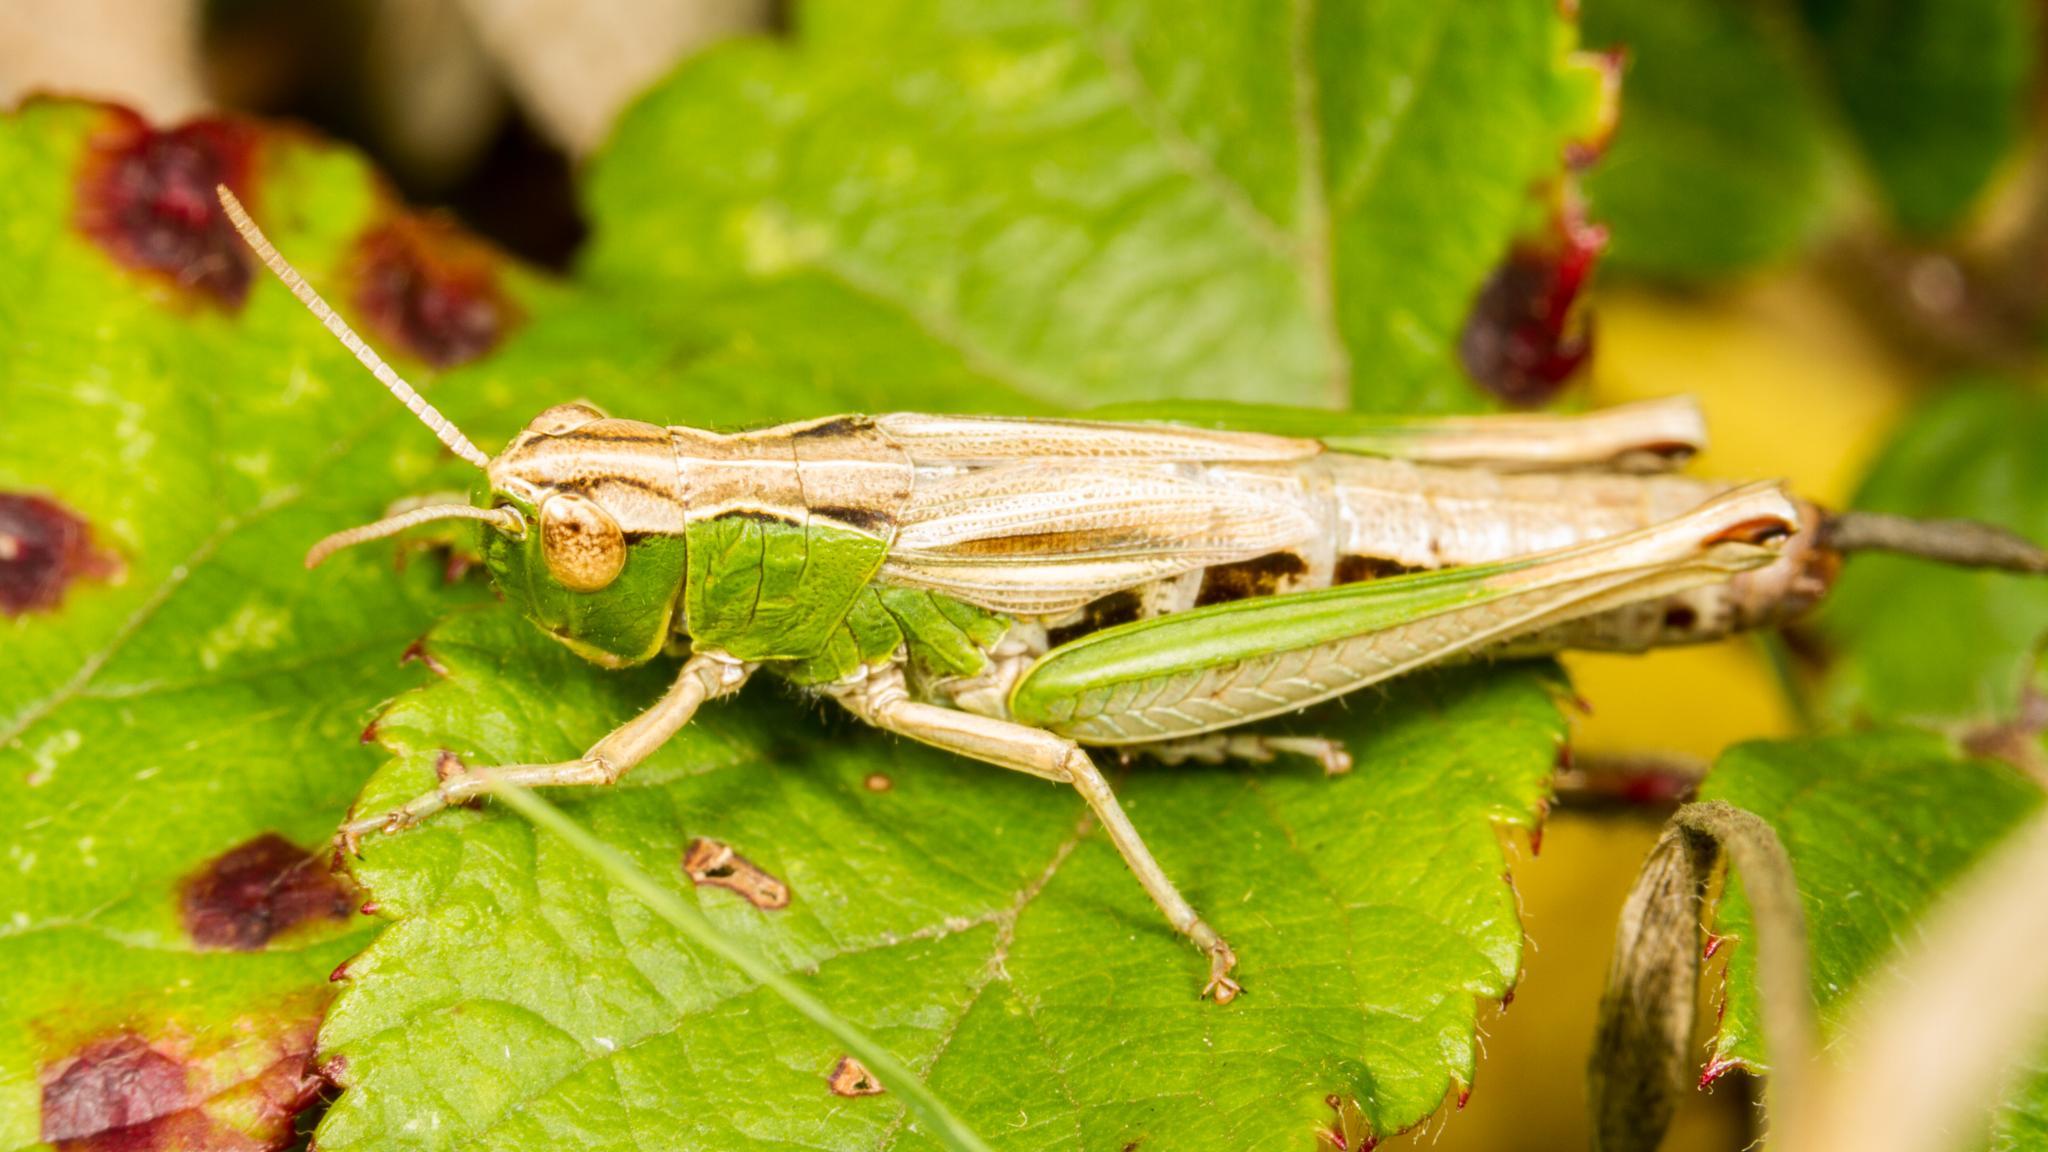 Grasshopper by David Arnold